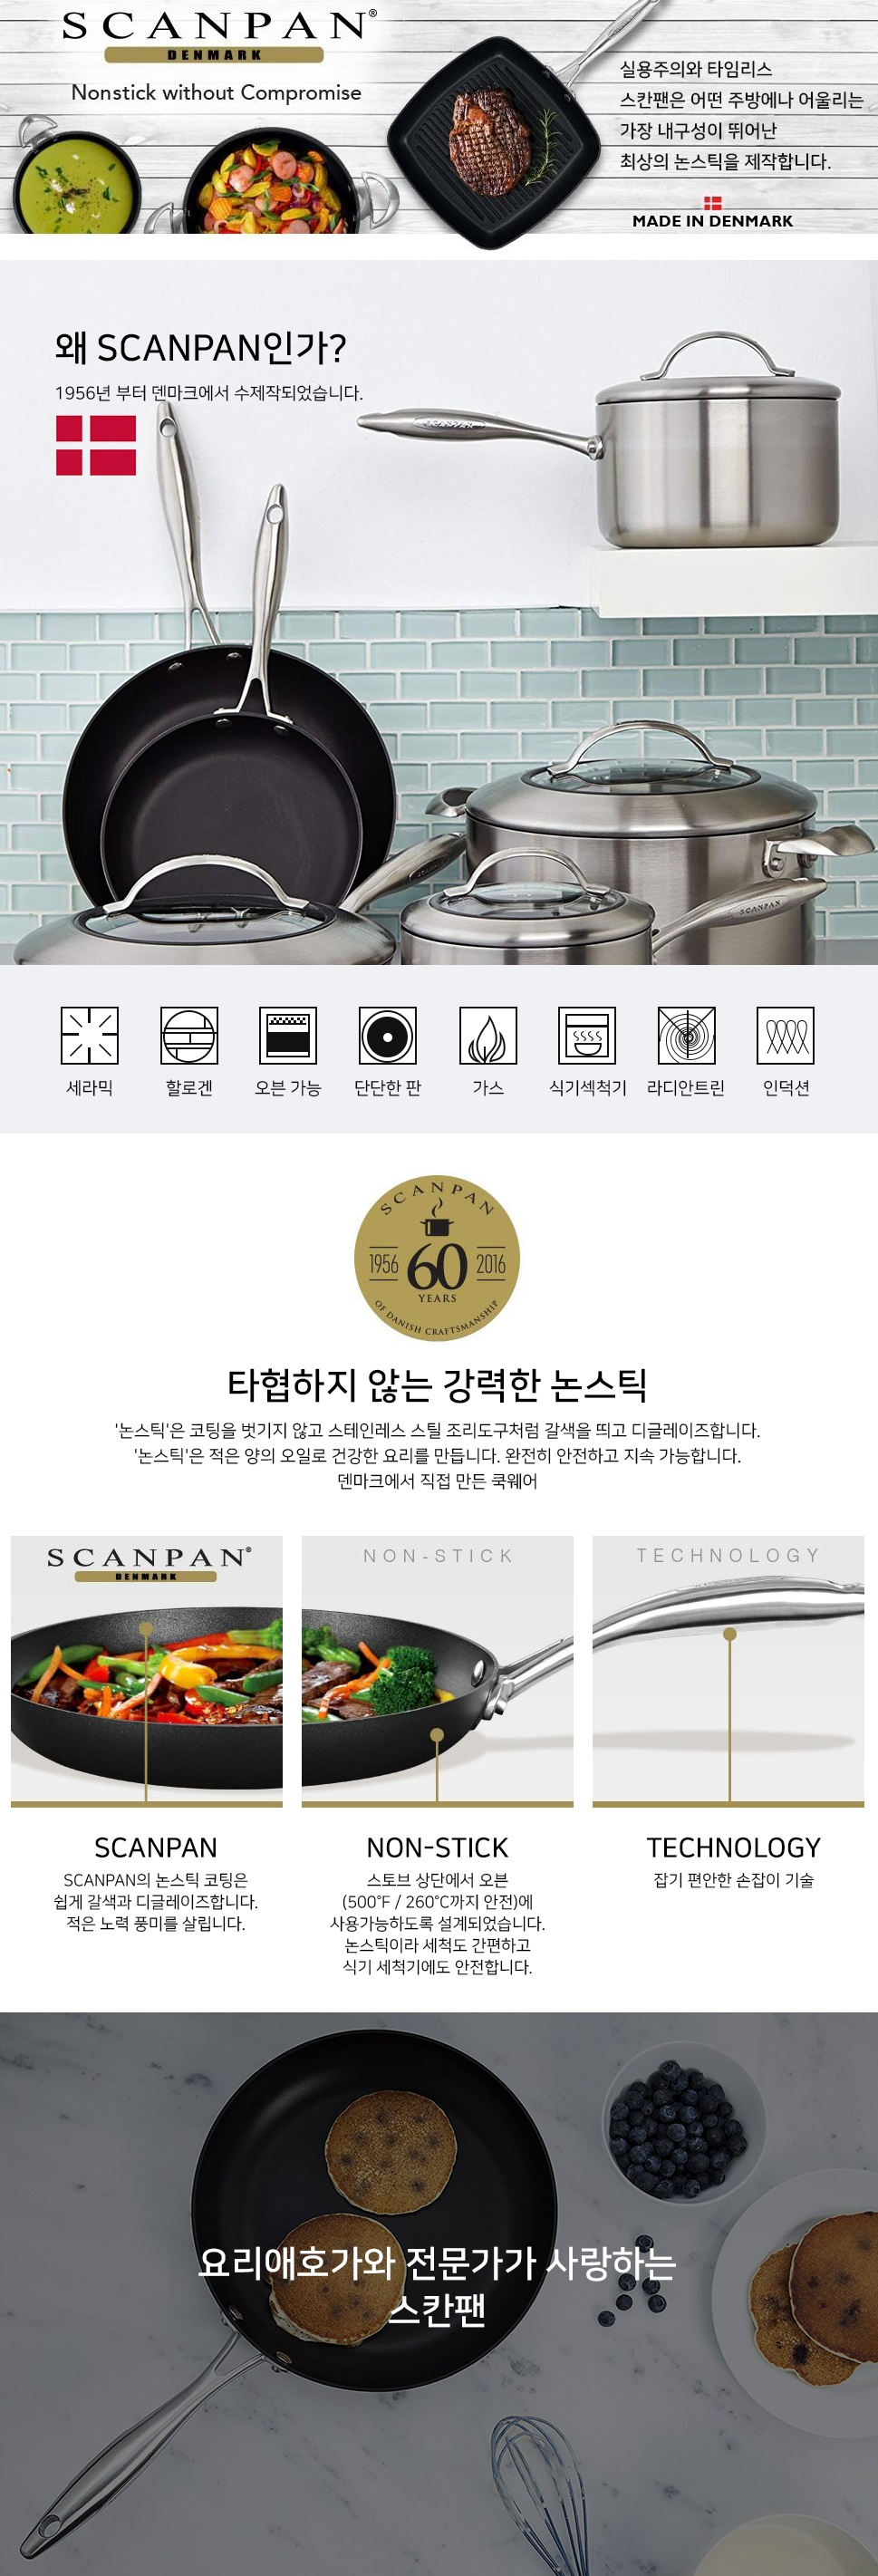 Scanpan_CTX_Frying_Pan_01_수정.jpg